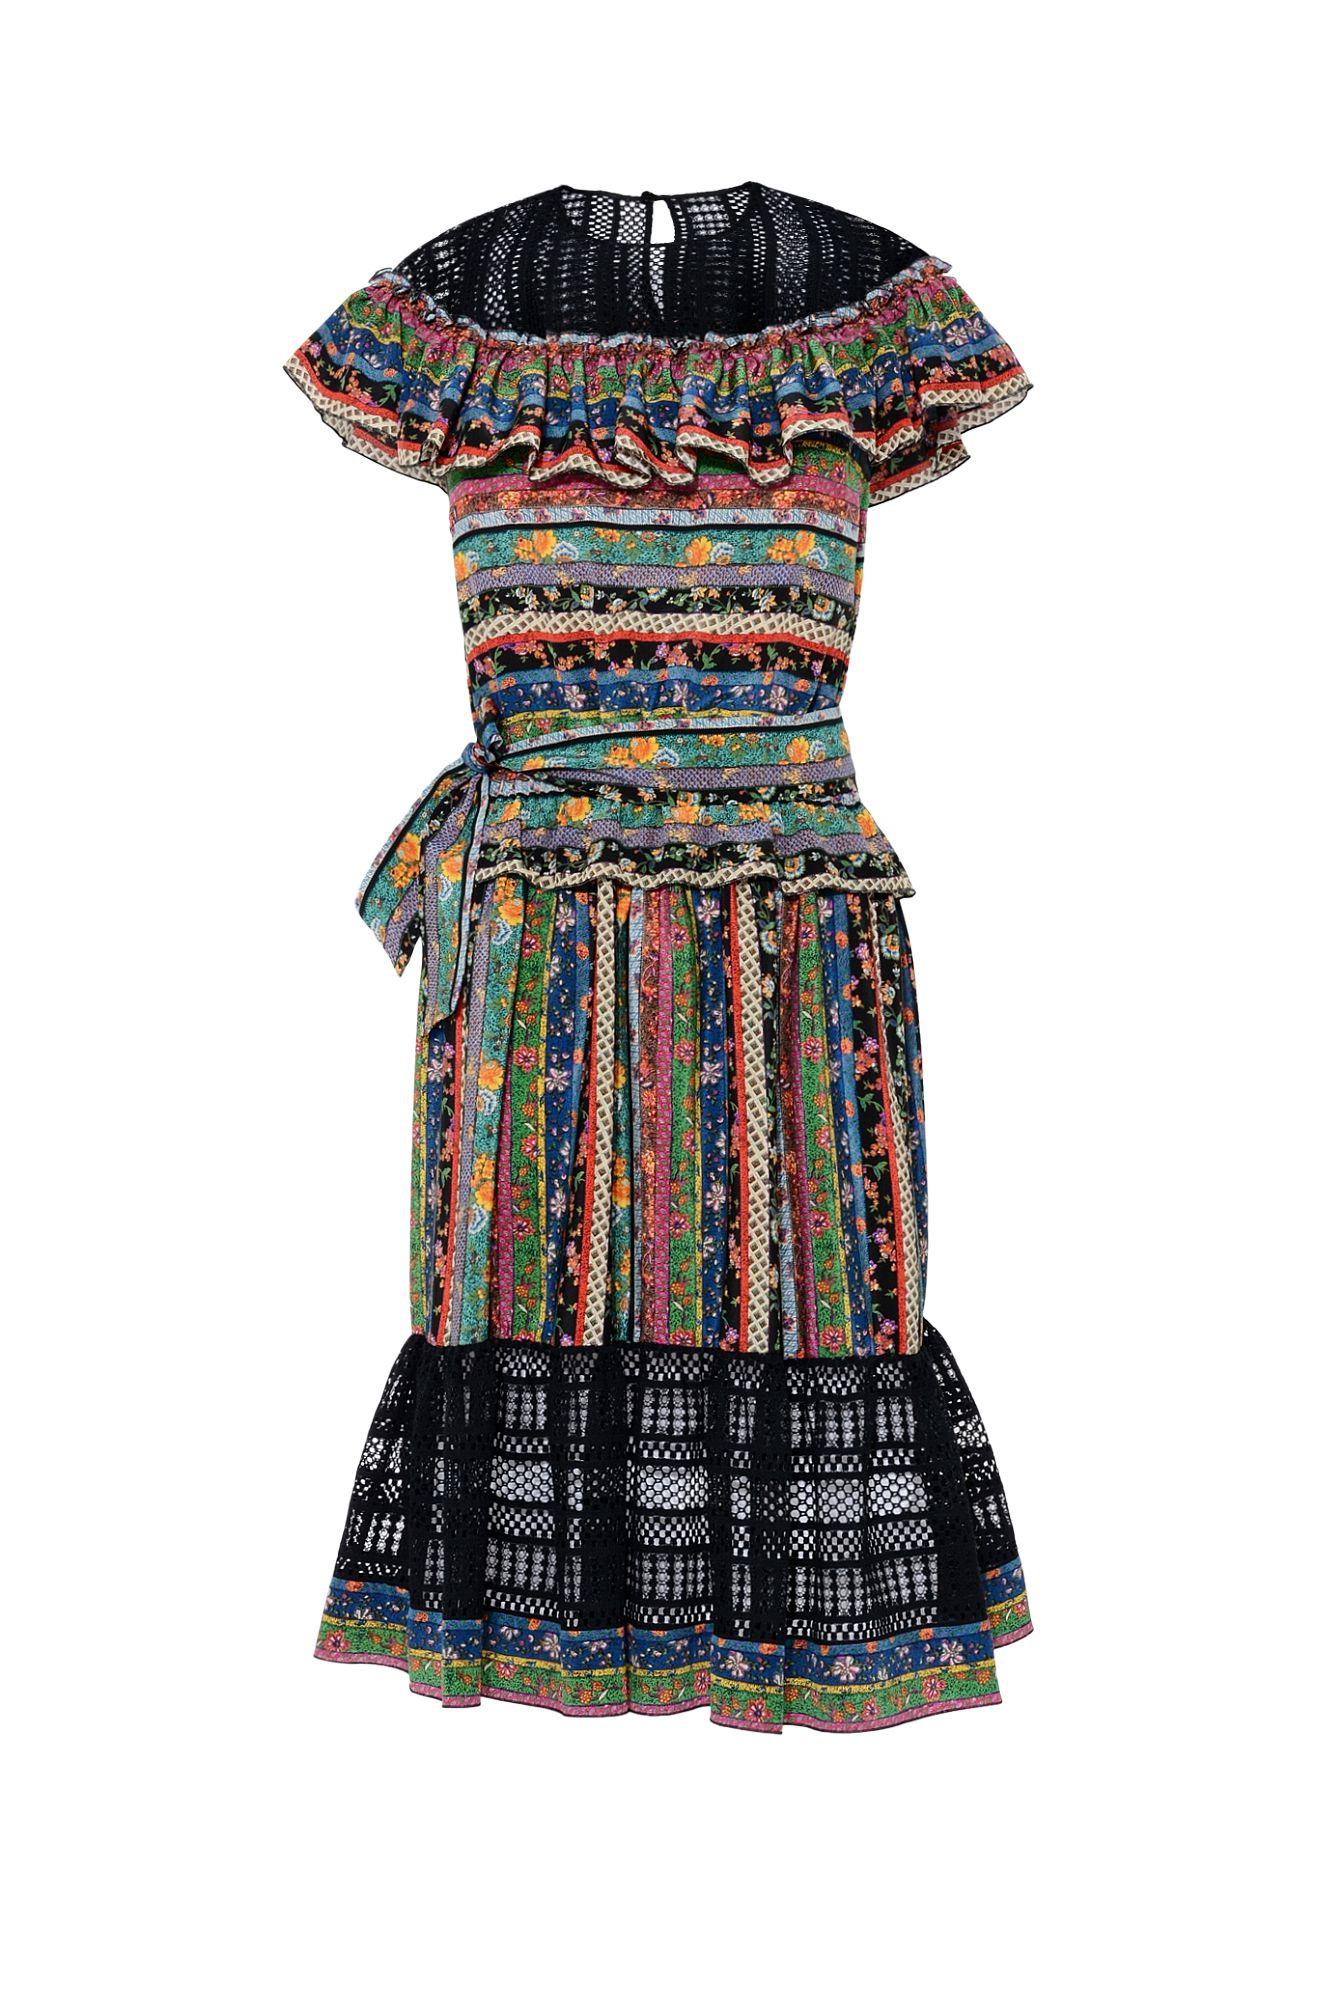 PATCHWORK STRIPED DRESS